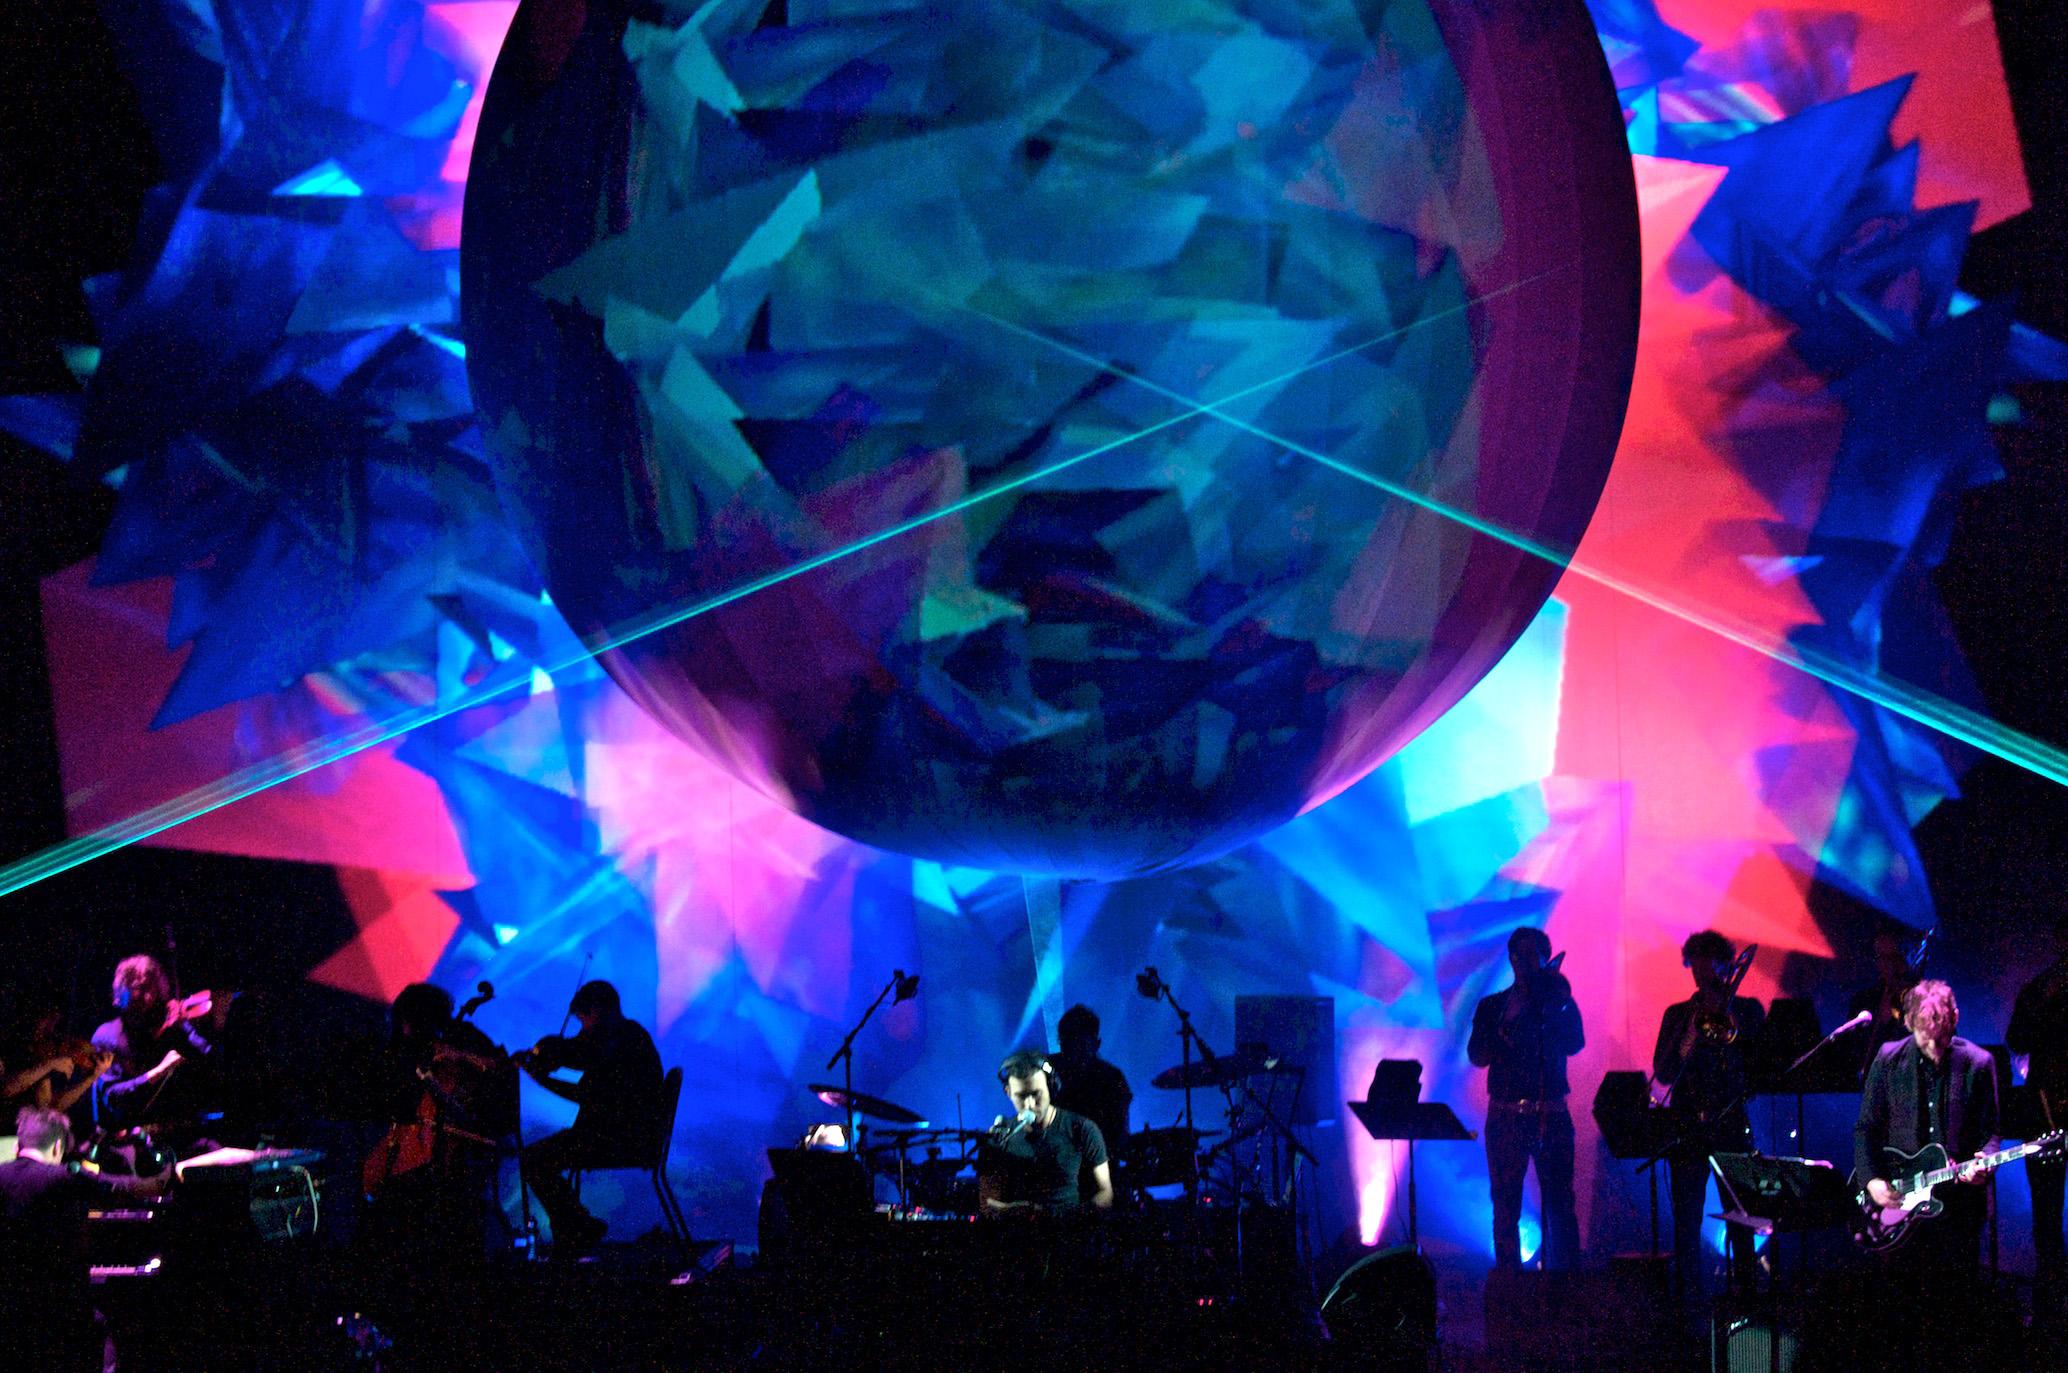 Planetarium - Earth